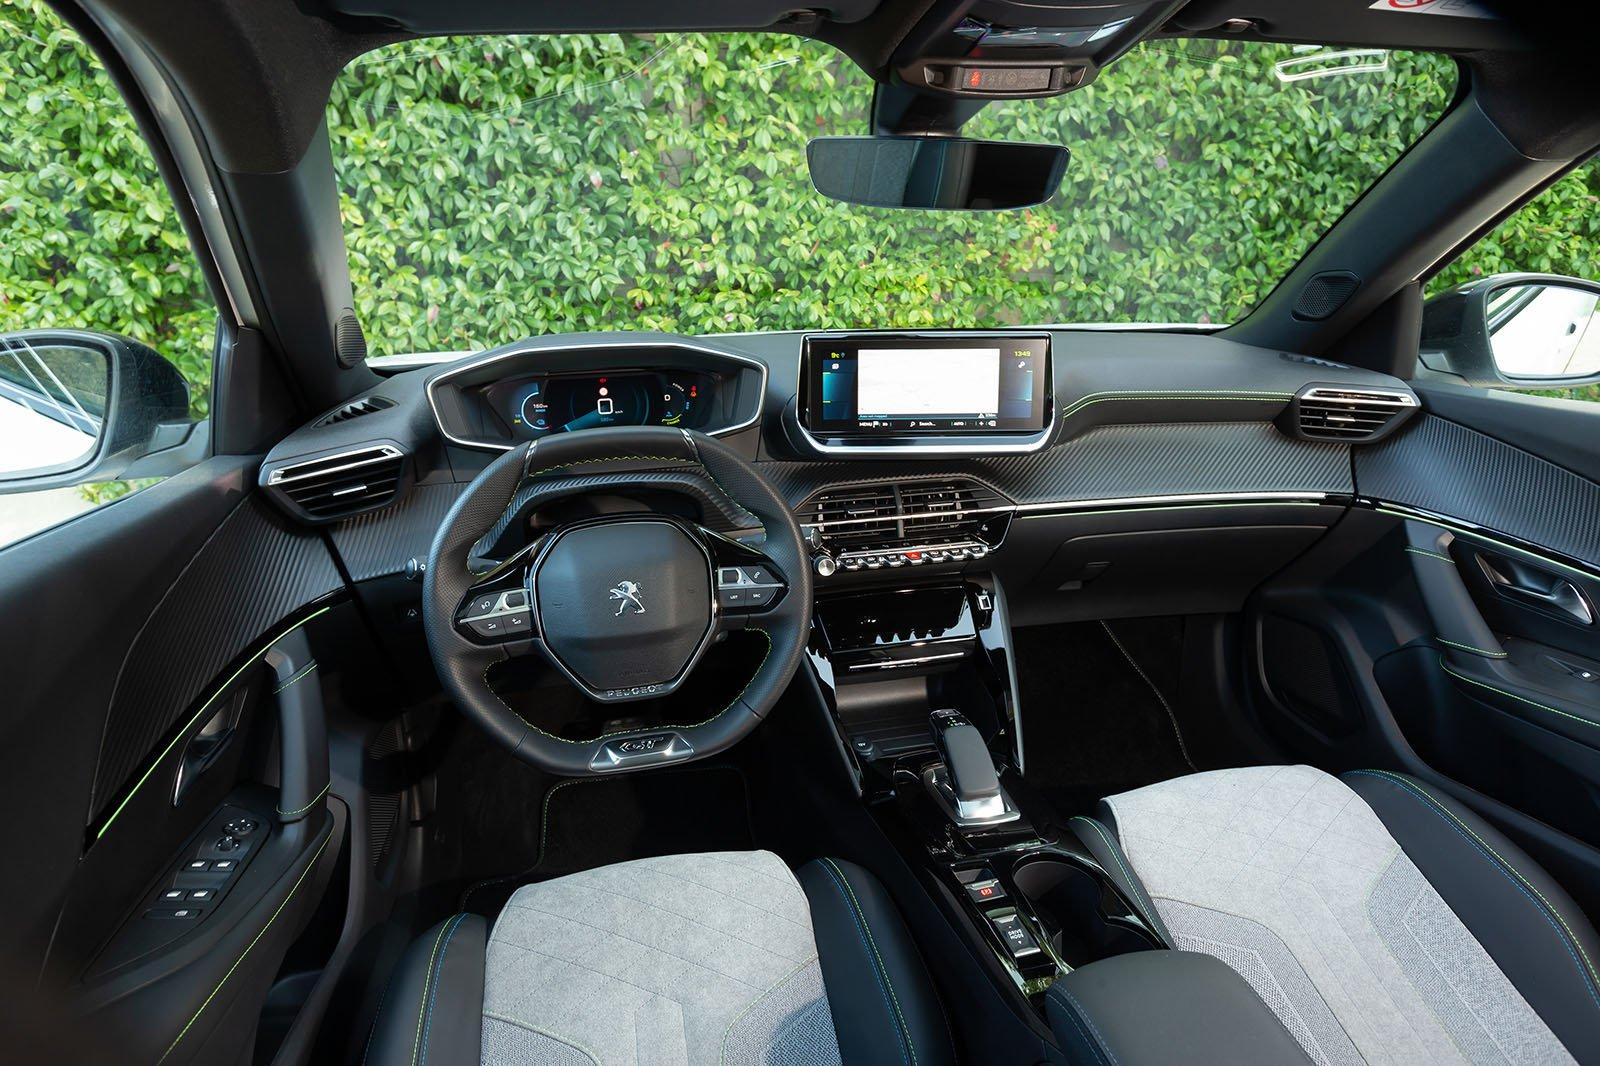 Peugeot e-2008 2019 LHD dashboard